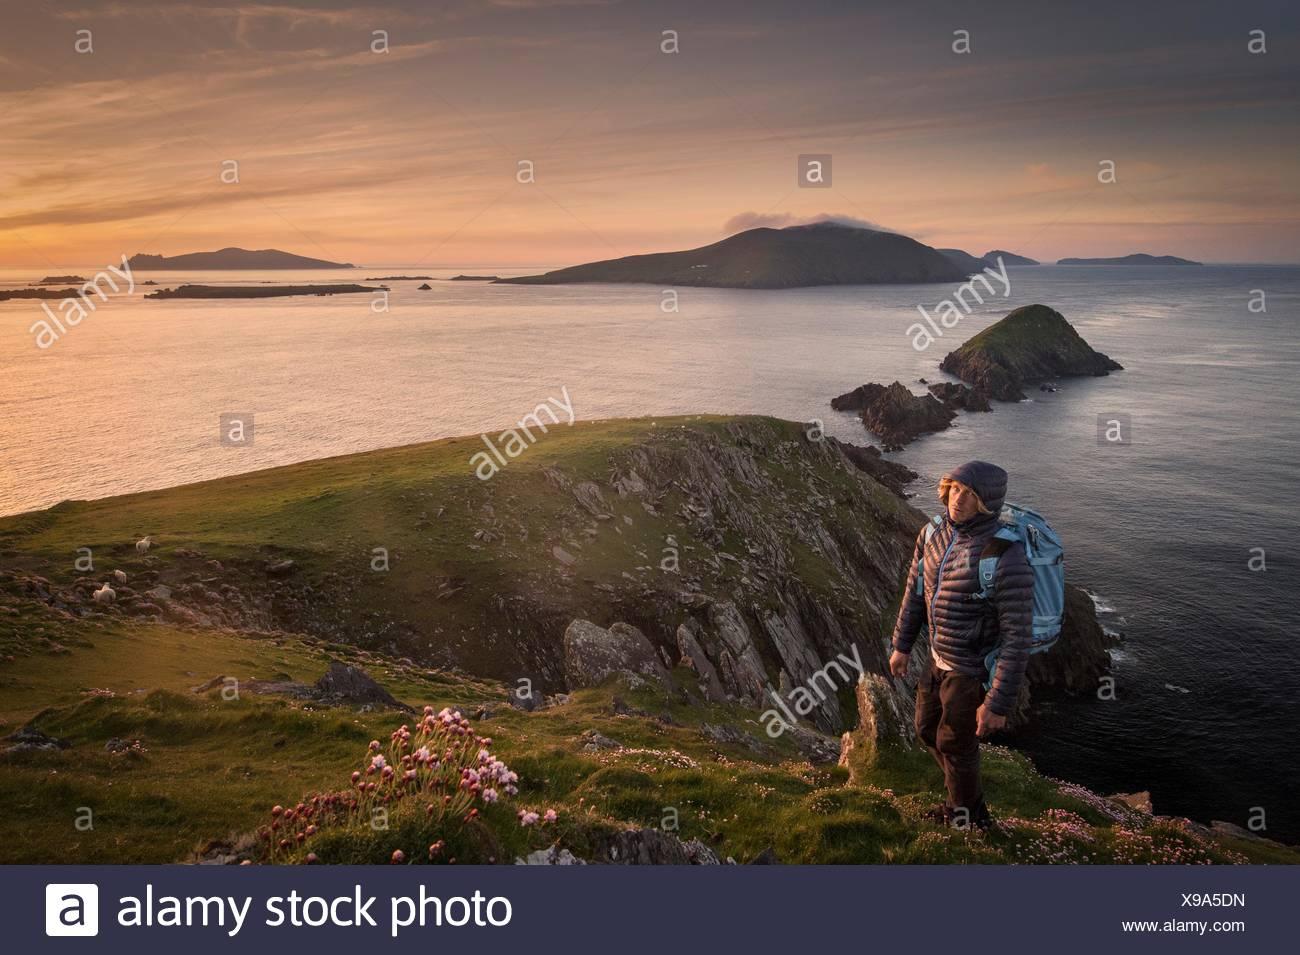 Mitte erwachsenen Mannes, Wandern, Slea Head, County Kerry, Irland Stockbild